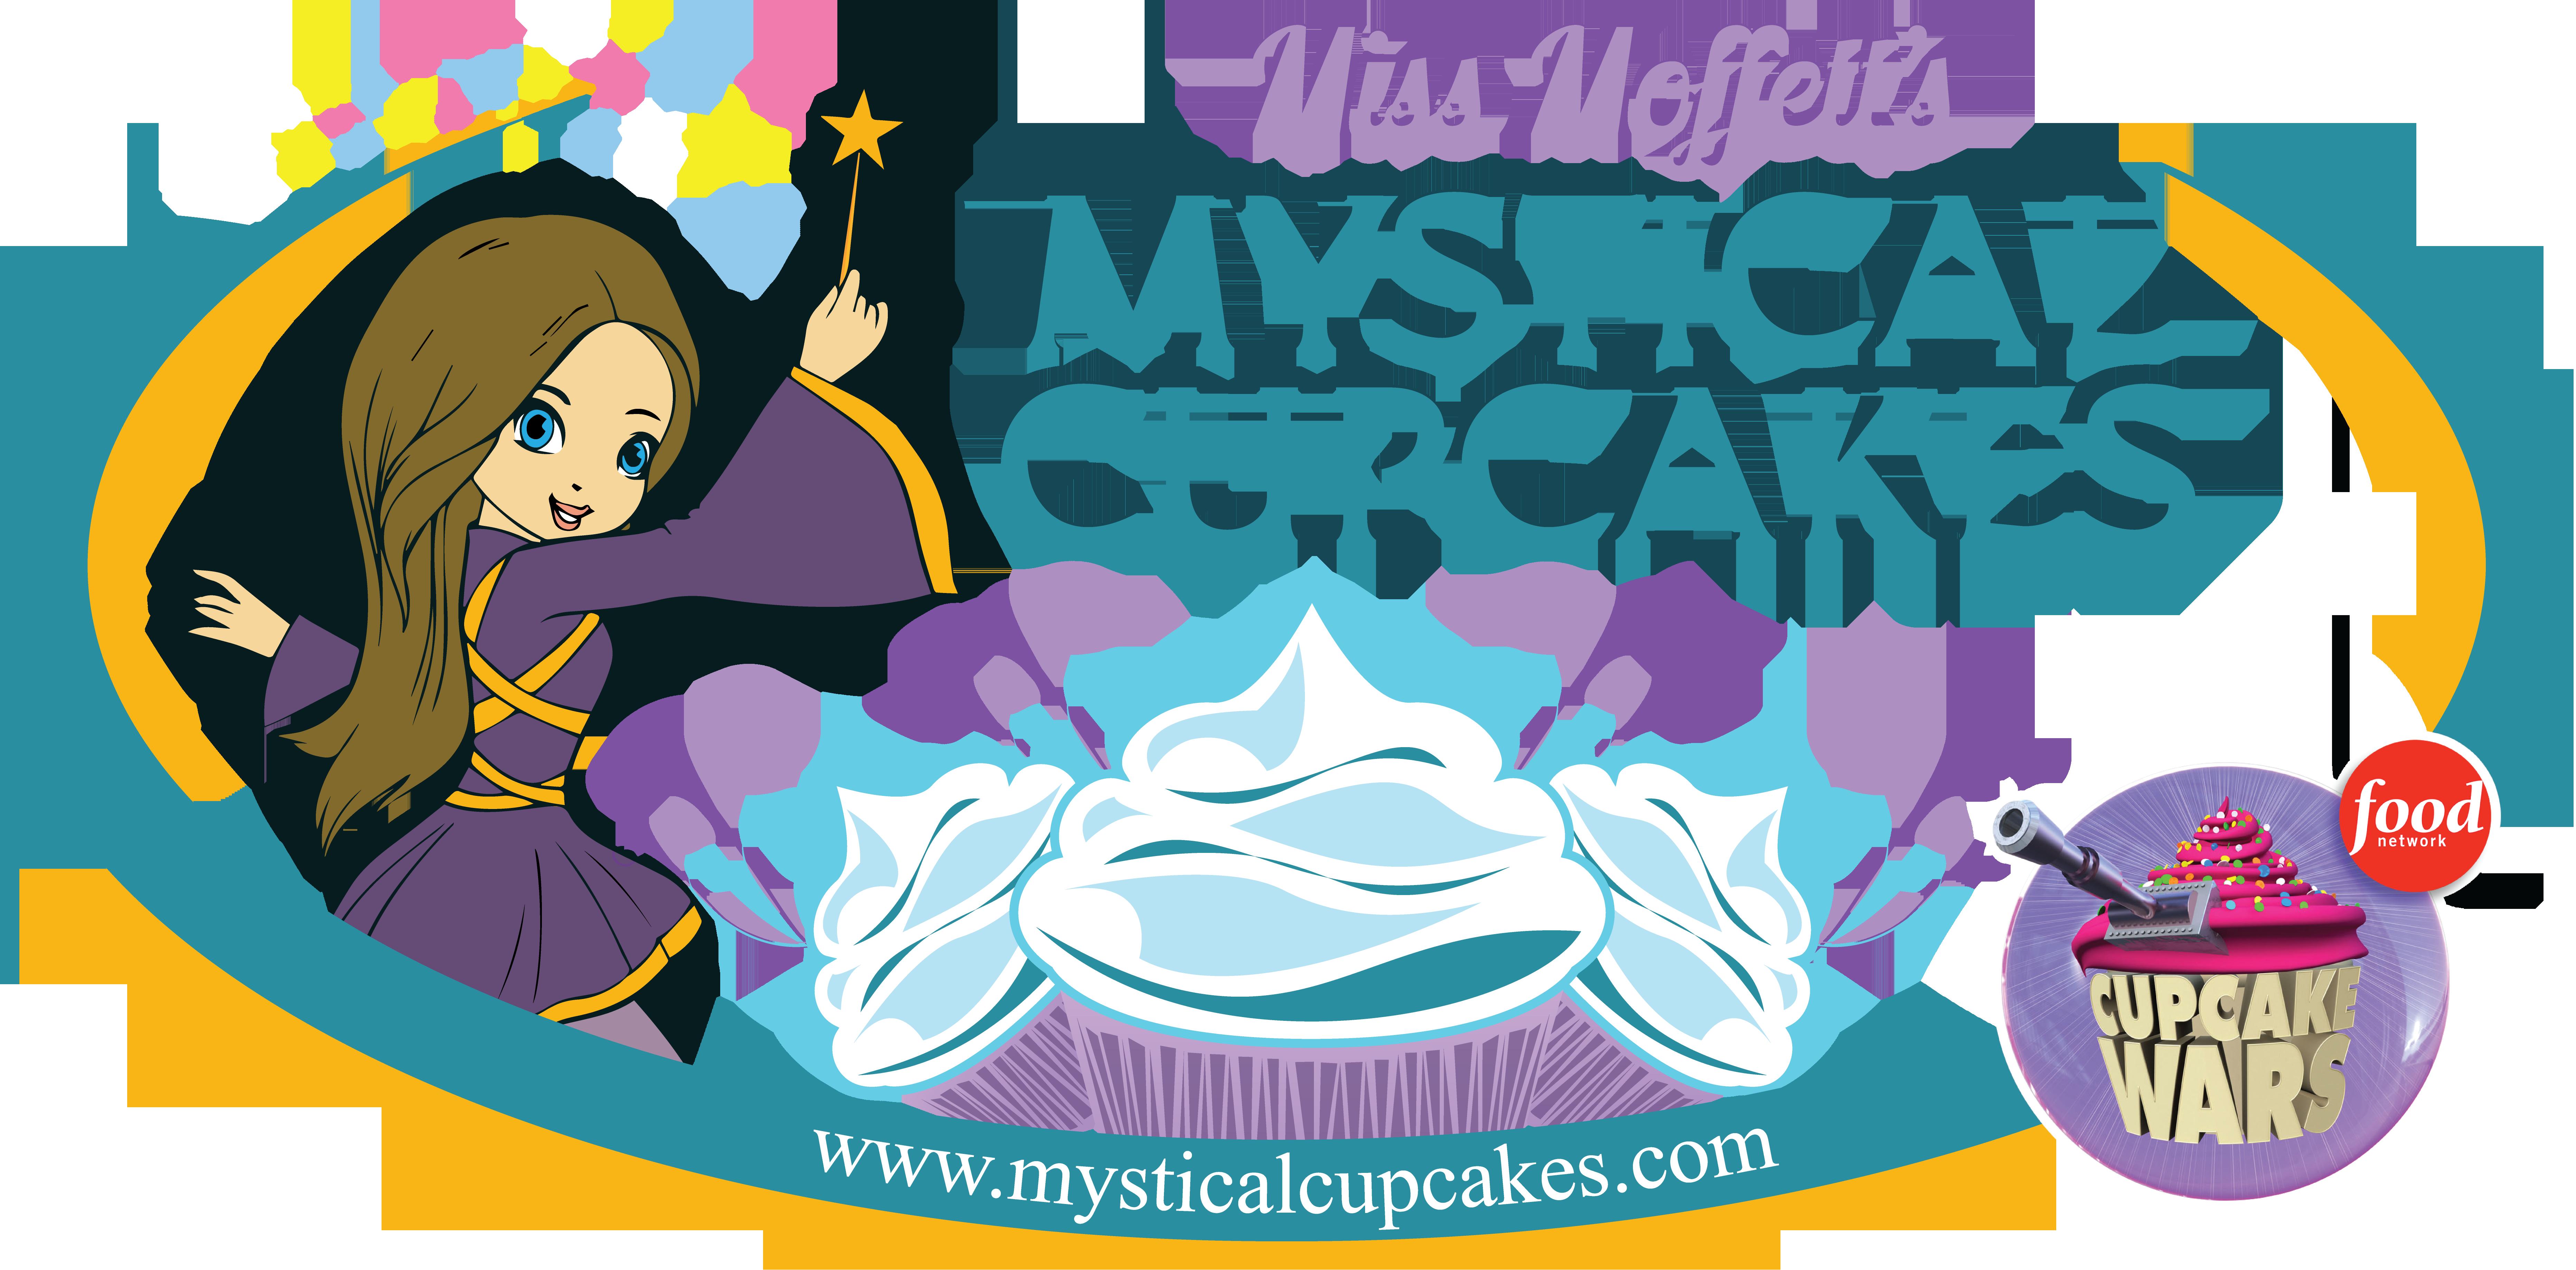 Miss Moffett's Mystical Cupcakes (Mall)